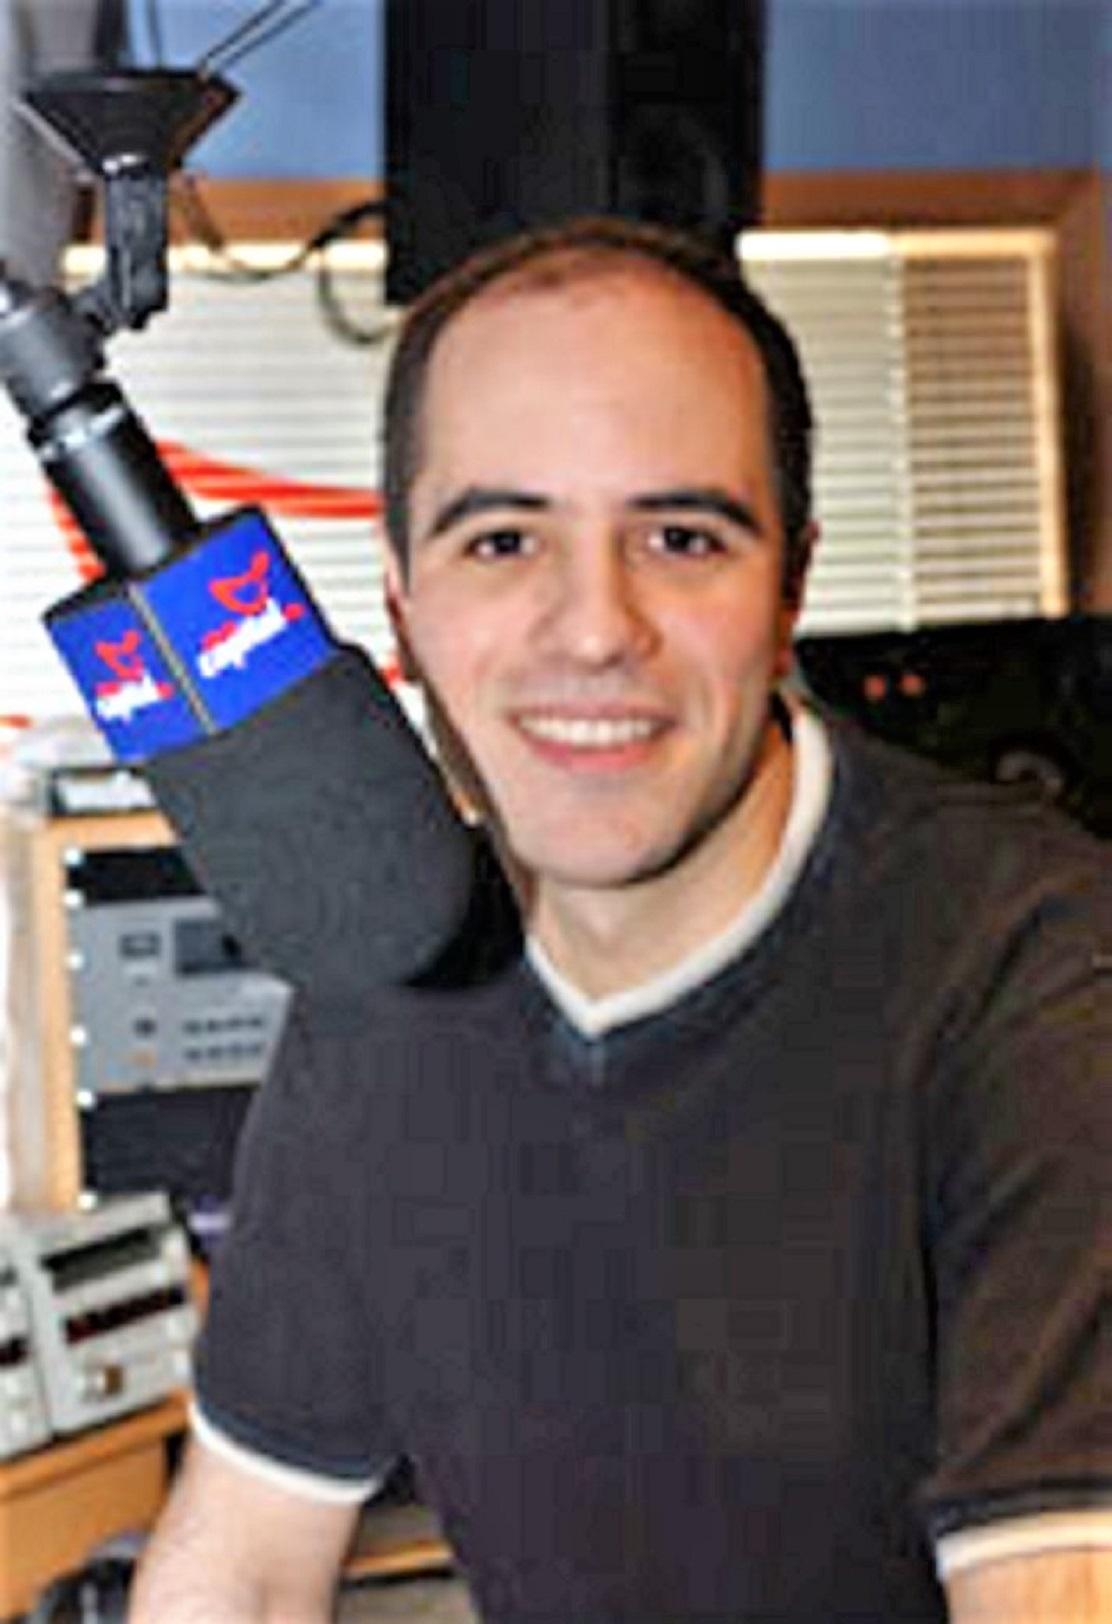 Philip Chryssikos - Capital FM